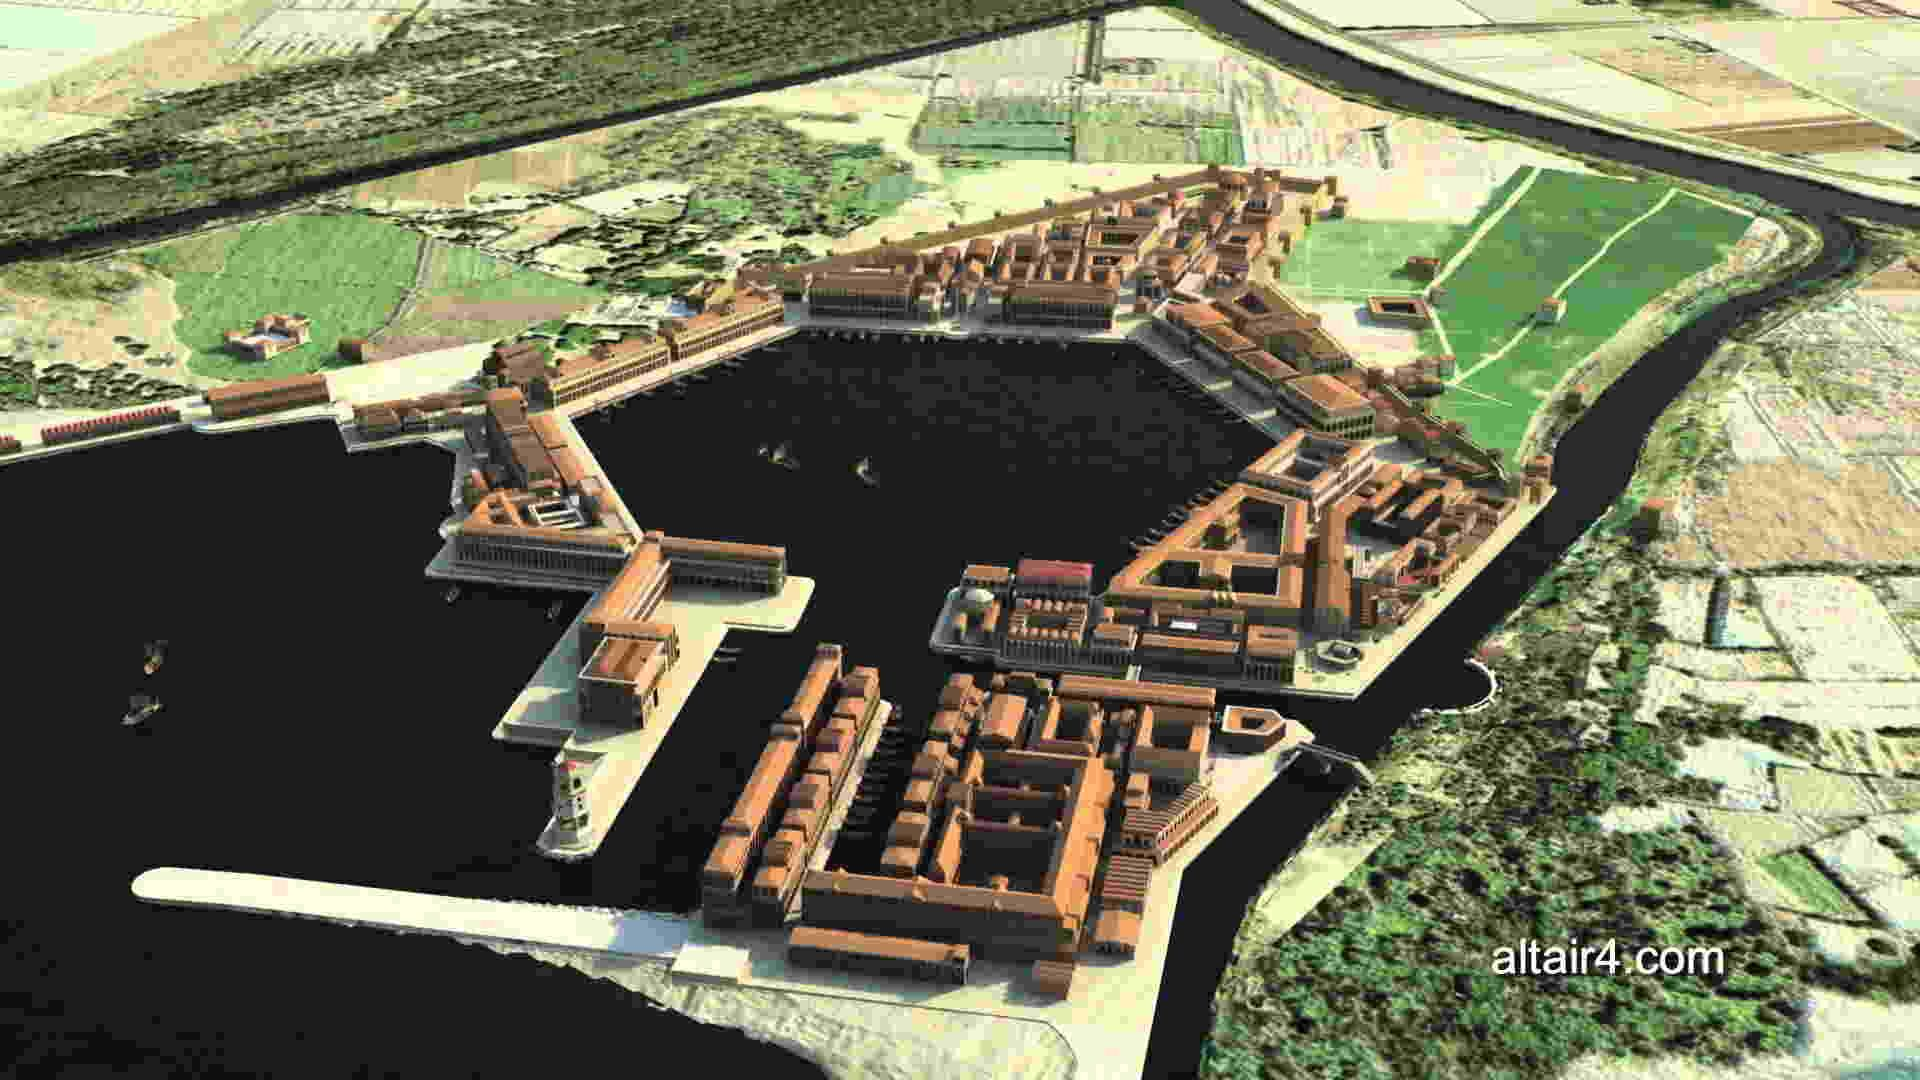 Ostia, Portus Romae